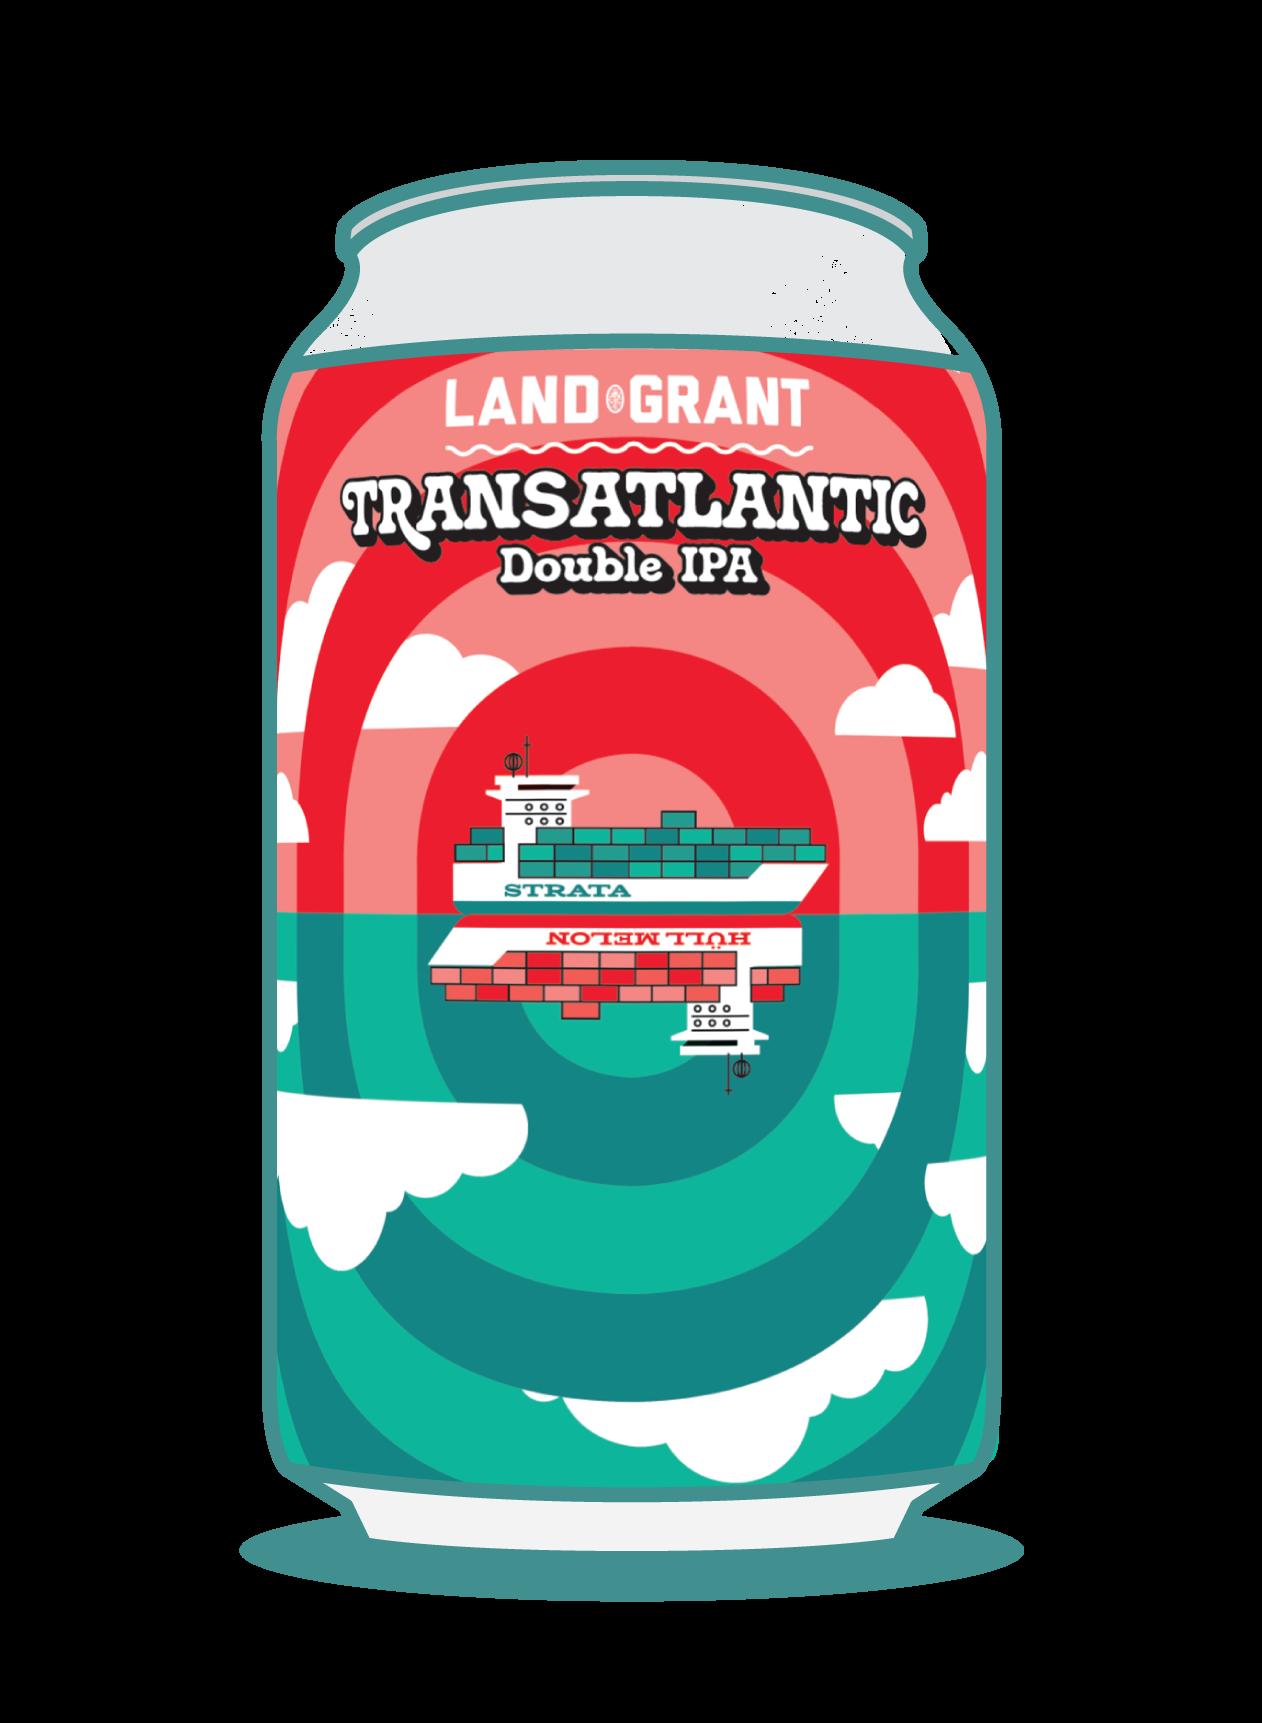 Transatlantic Image